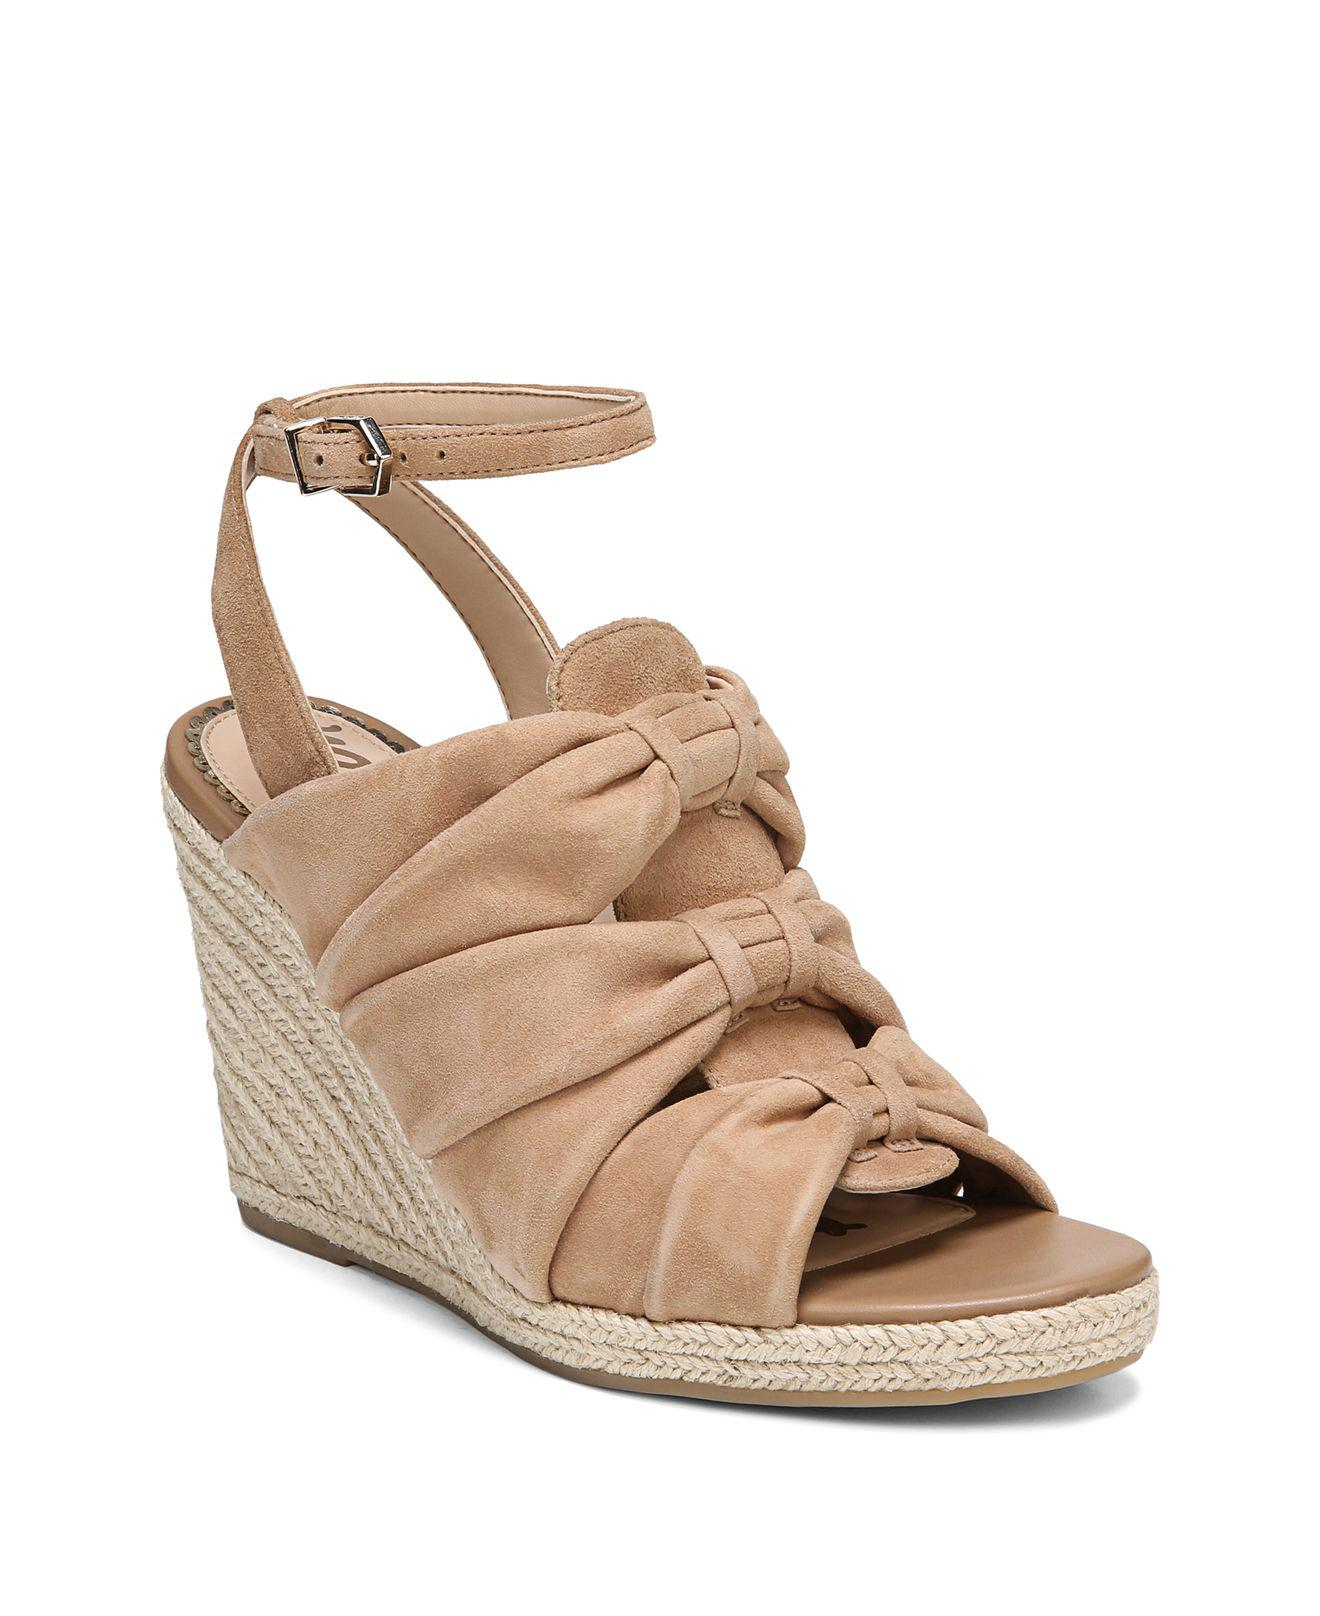 Sam Edelman Women's Awan Suede Espadrille Wedge Sandals lPw5pYu